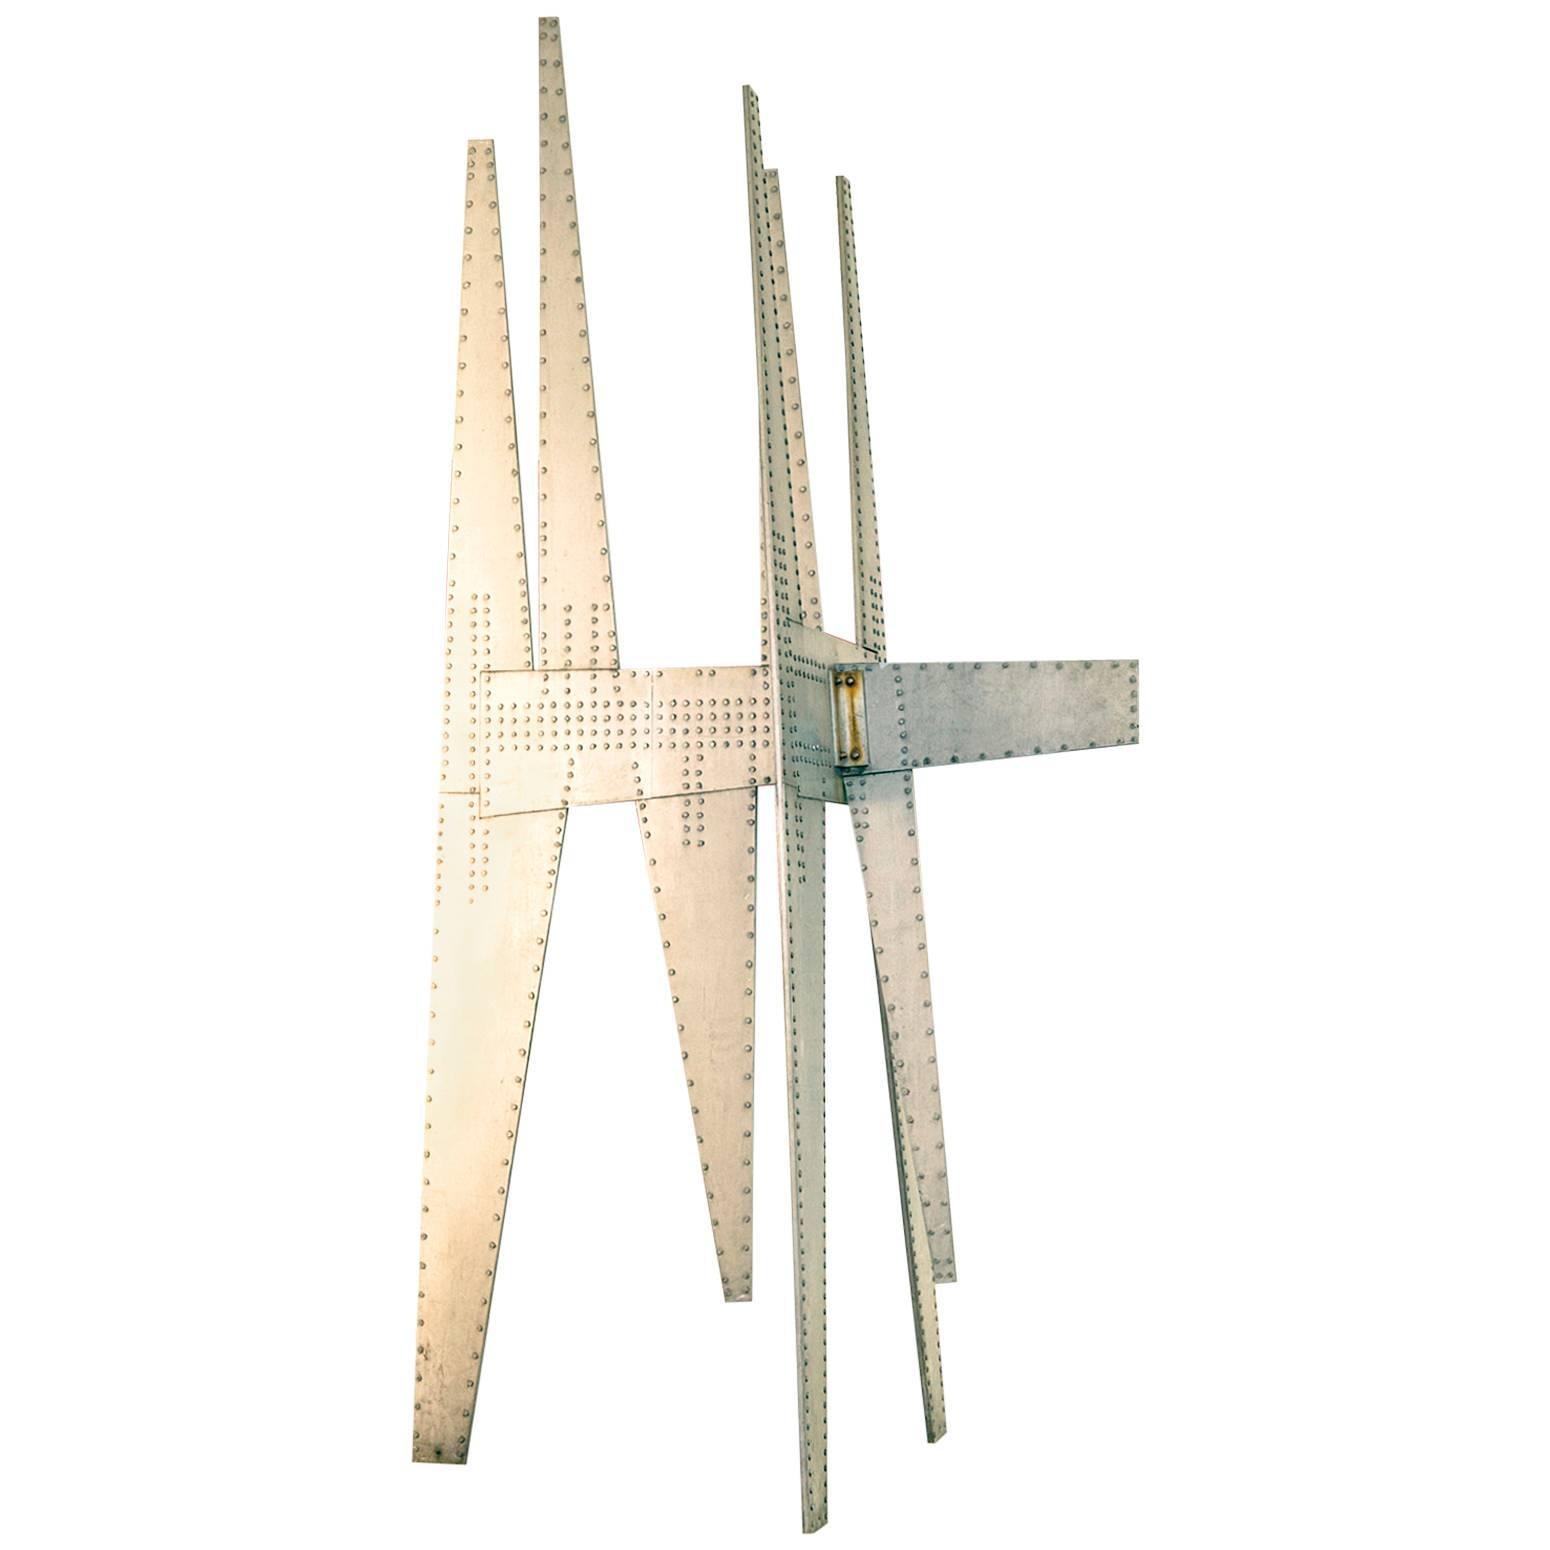 Modernist Sculpture by Yasuhide Kobashi